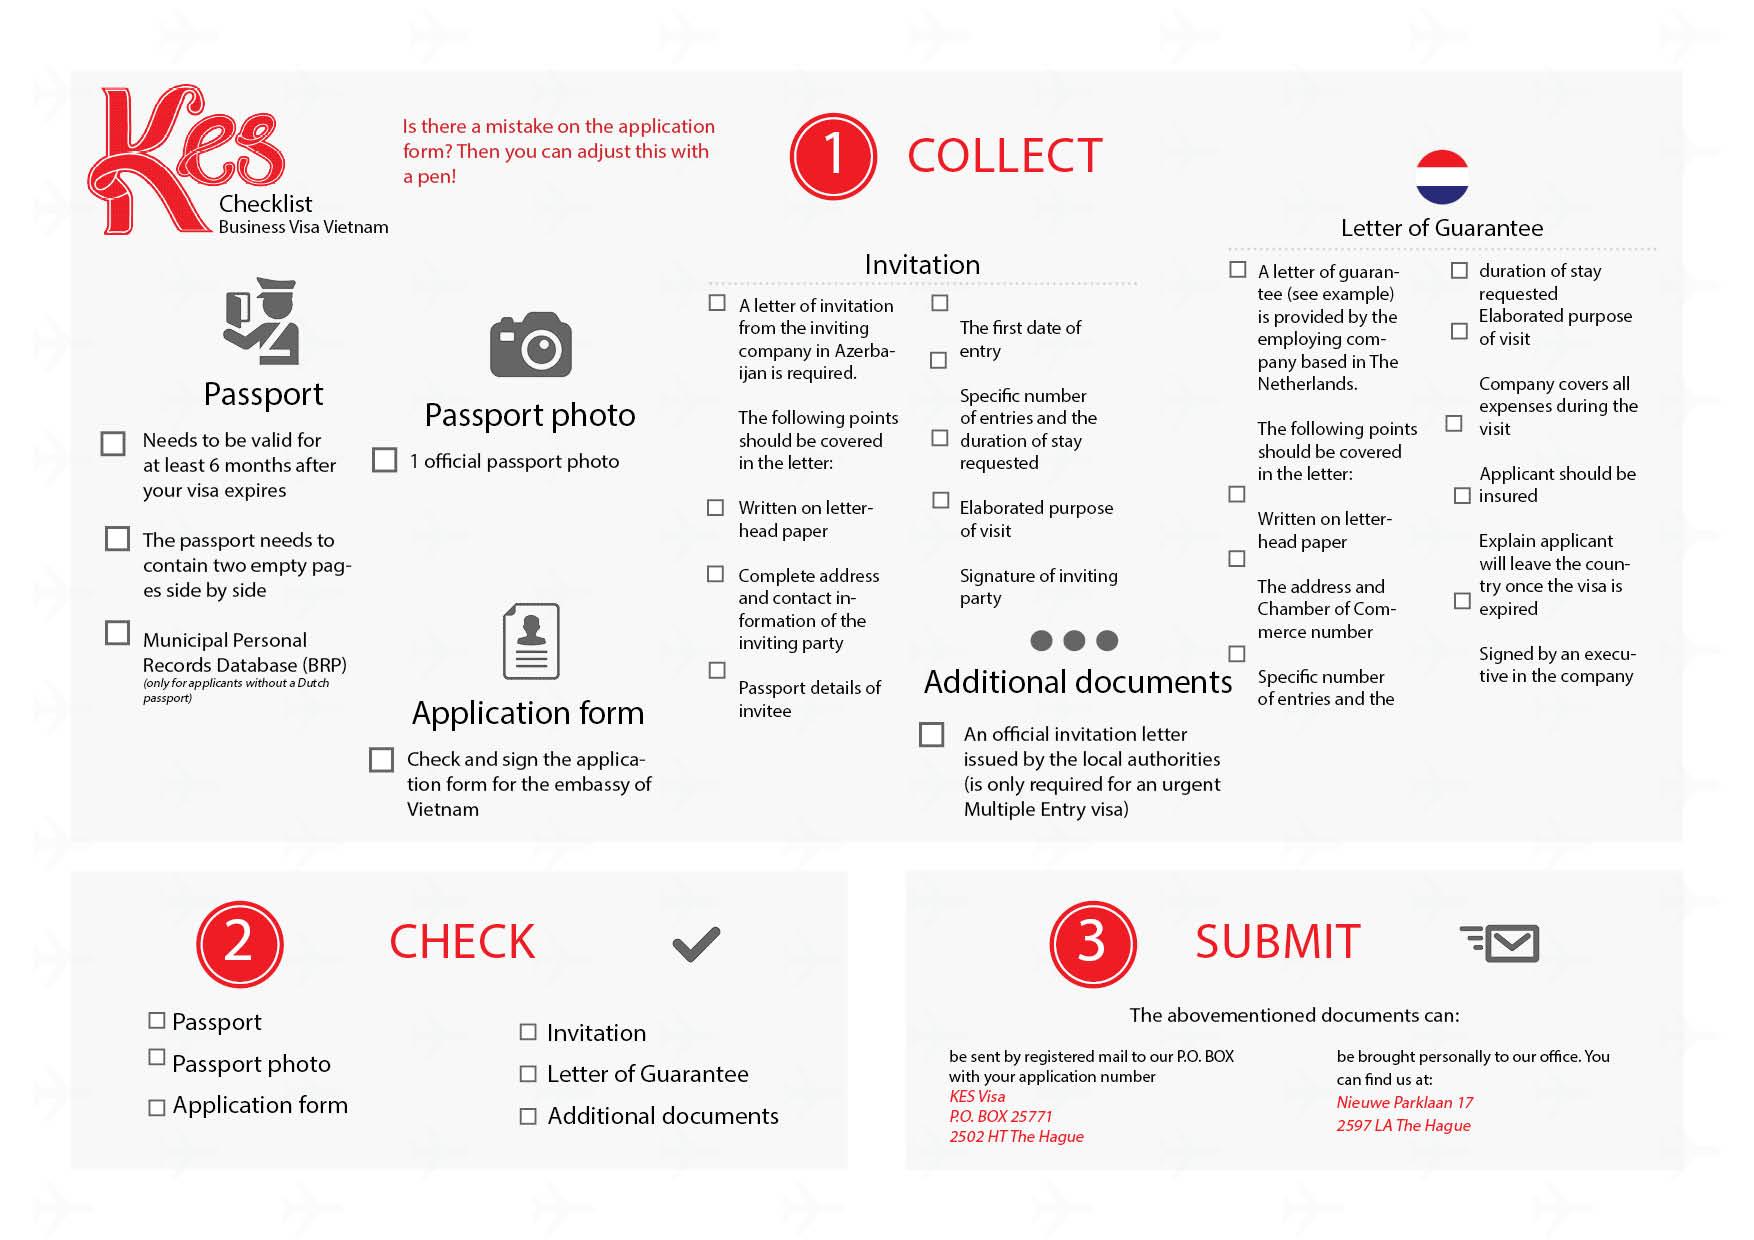 Visa vietnam checklist visa vietnam tourist checklist visa vietnam business spiritdancerdesigns Images